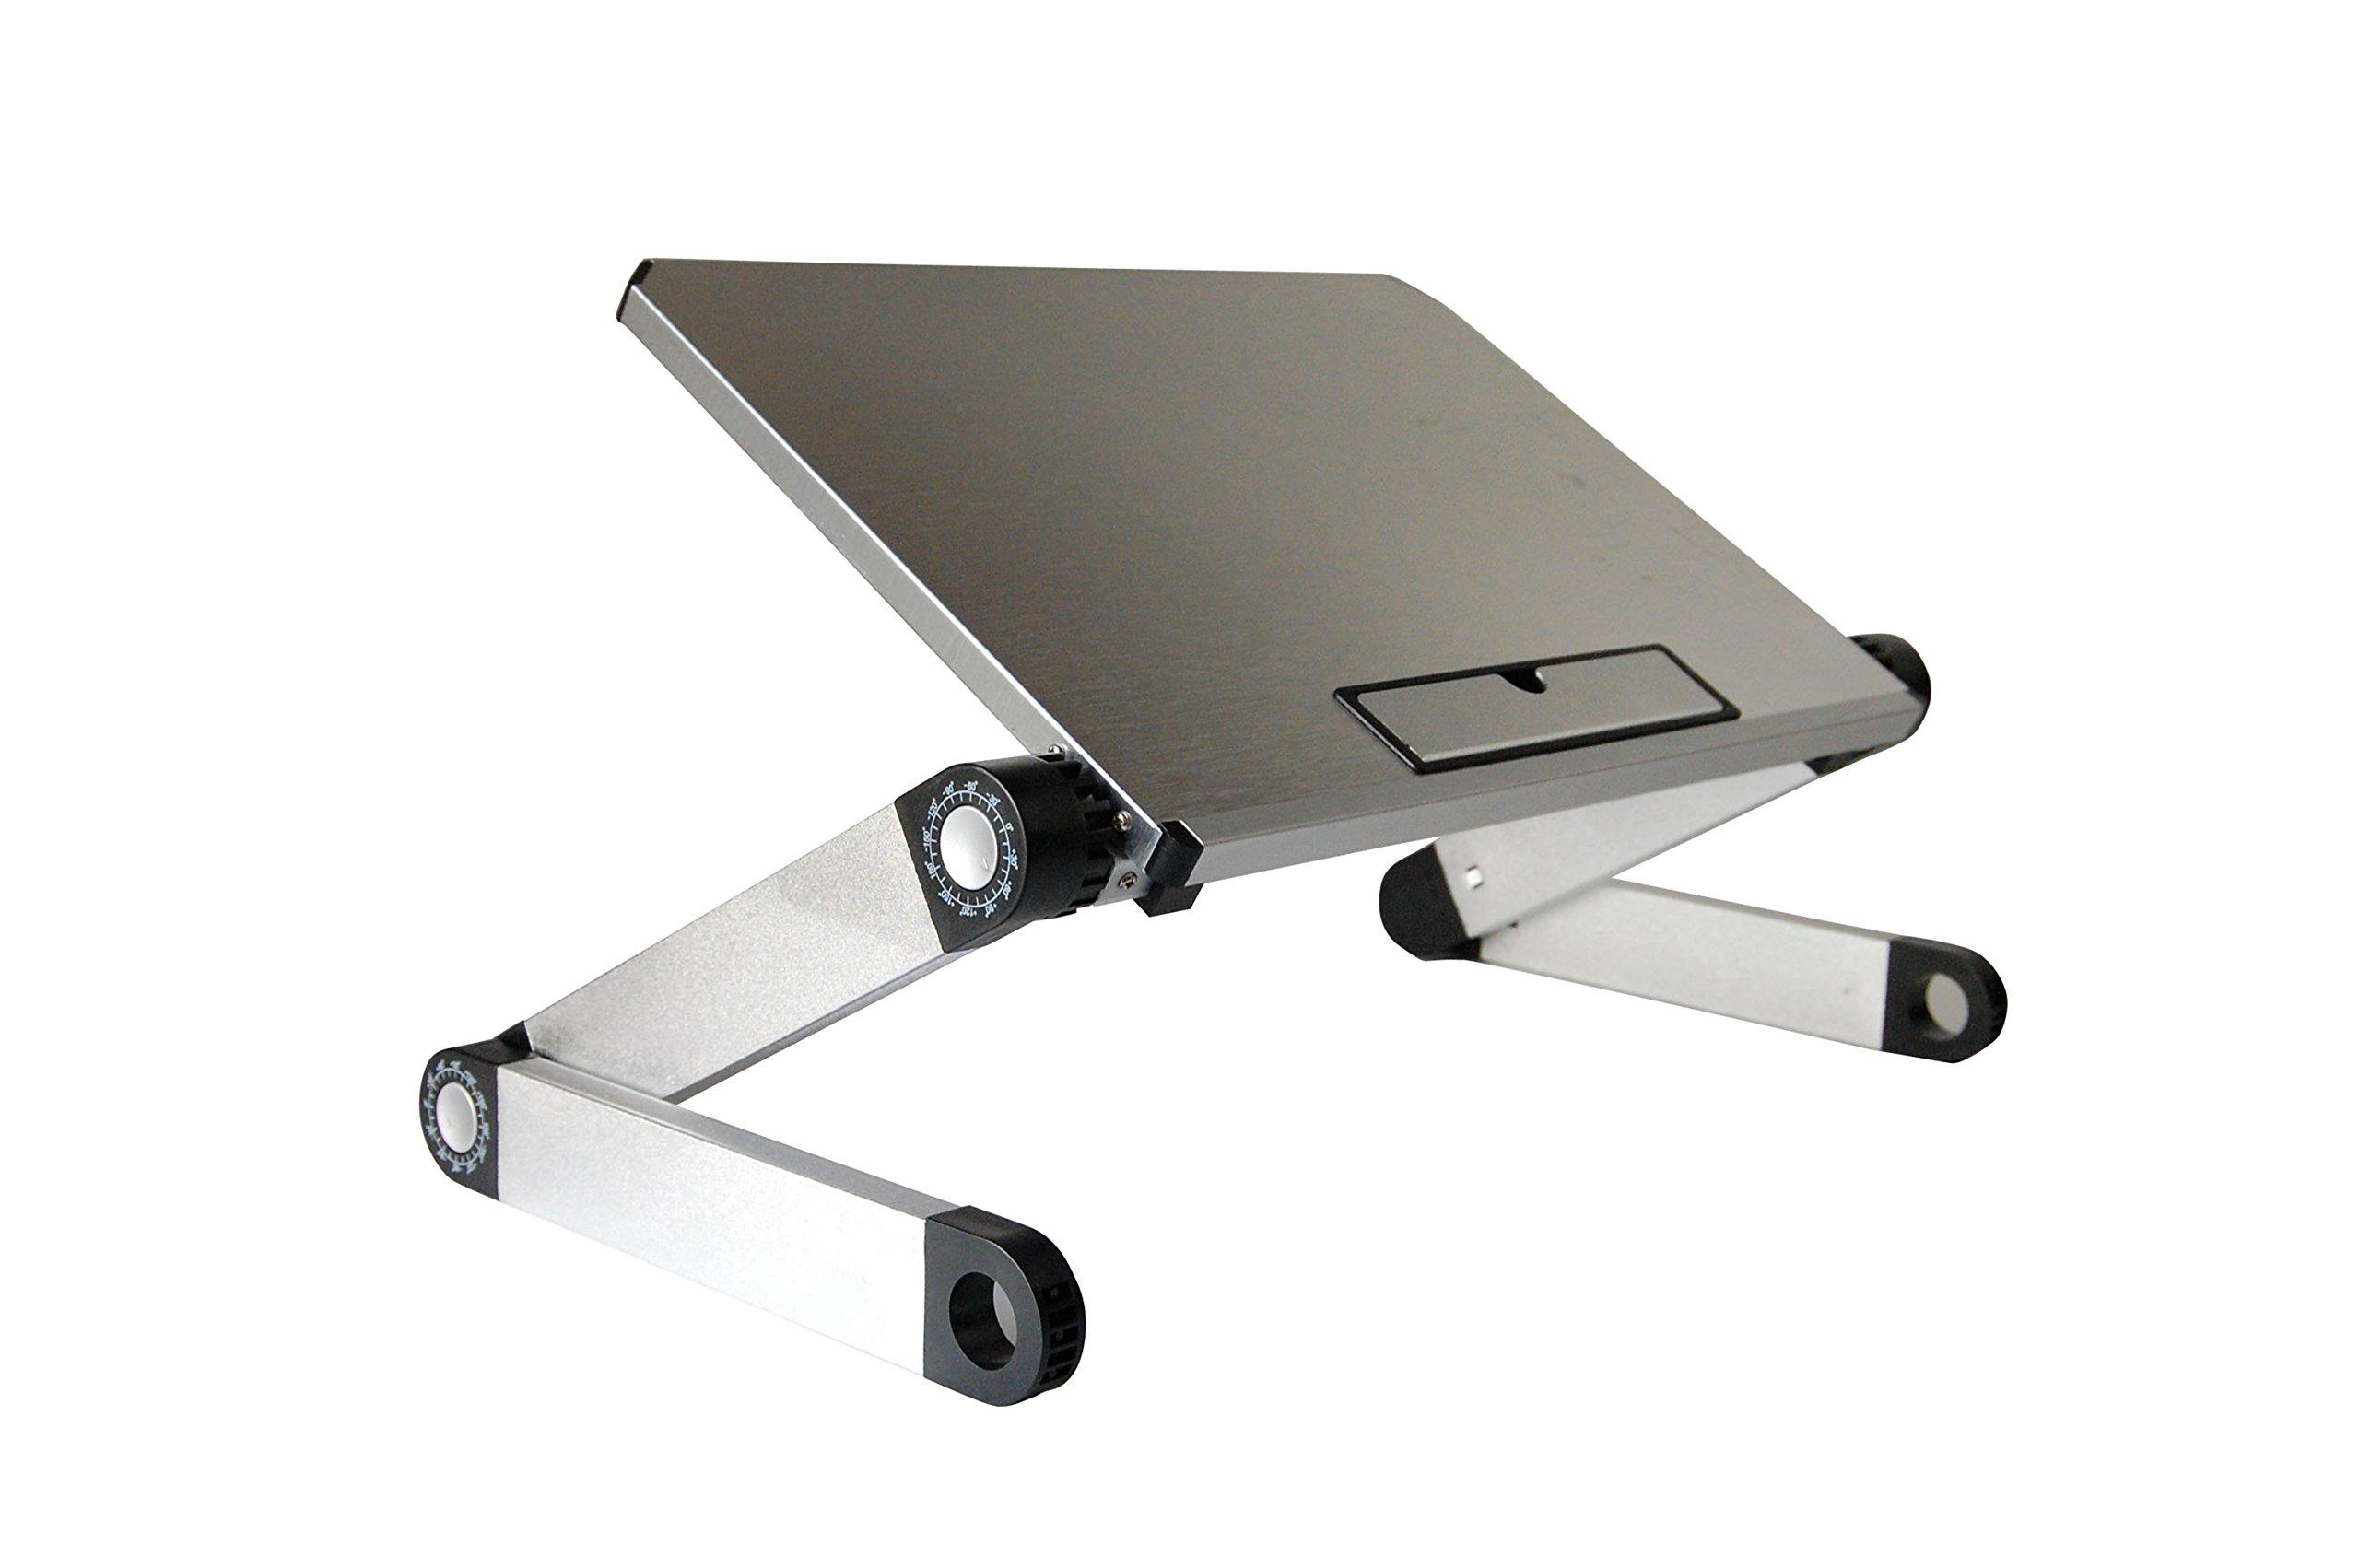 WorkEZ Light Ergonomic Portable Lightweight Aluminum Laptop Cooling Stand. Folding Adjustable Height & Angle Notebook Computer Riser Cooler Lap Desk by Uncaged Ergonomics